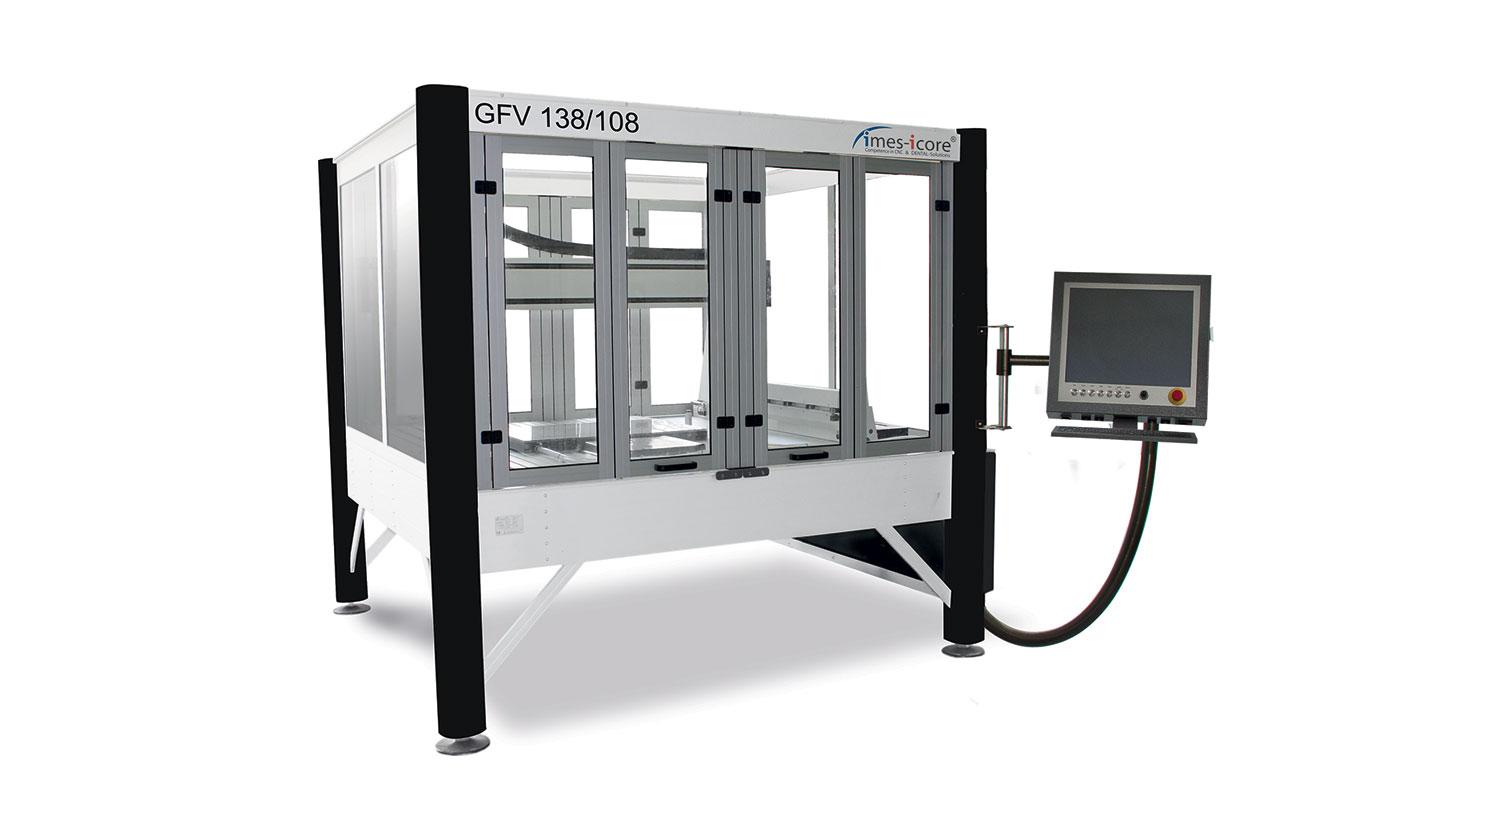 INT CNC Imes Icore GFV